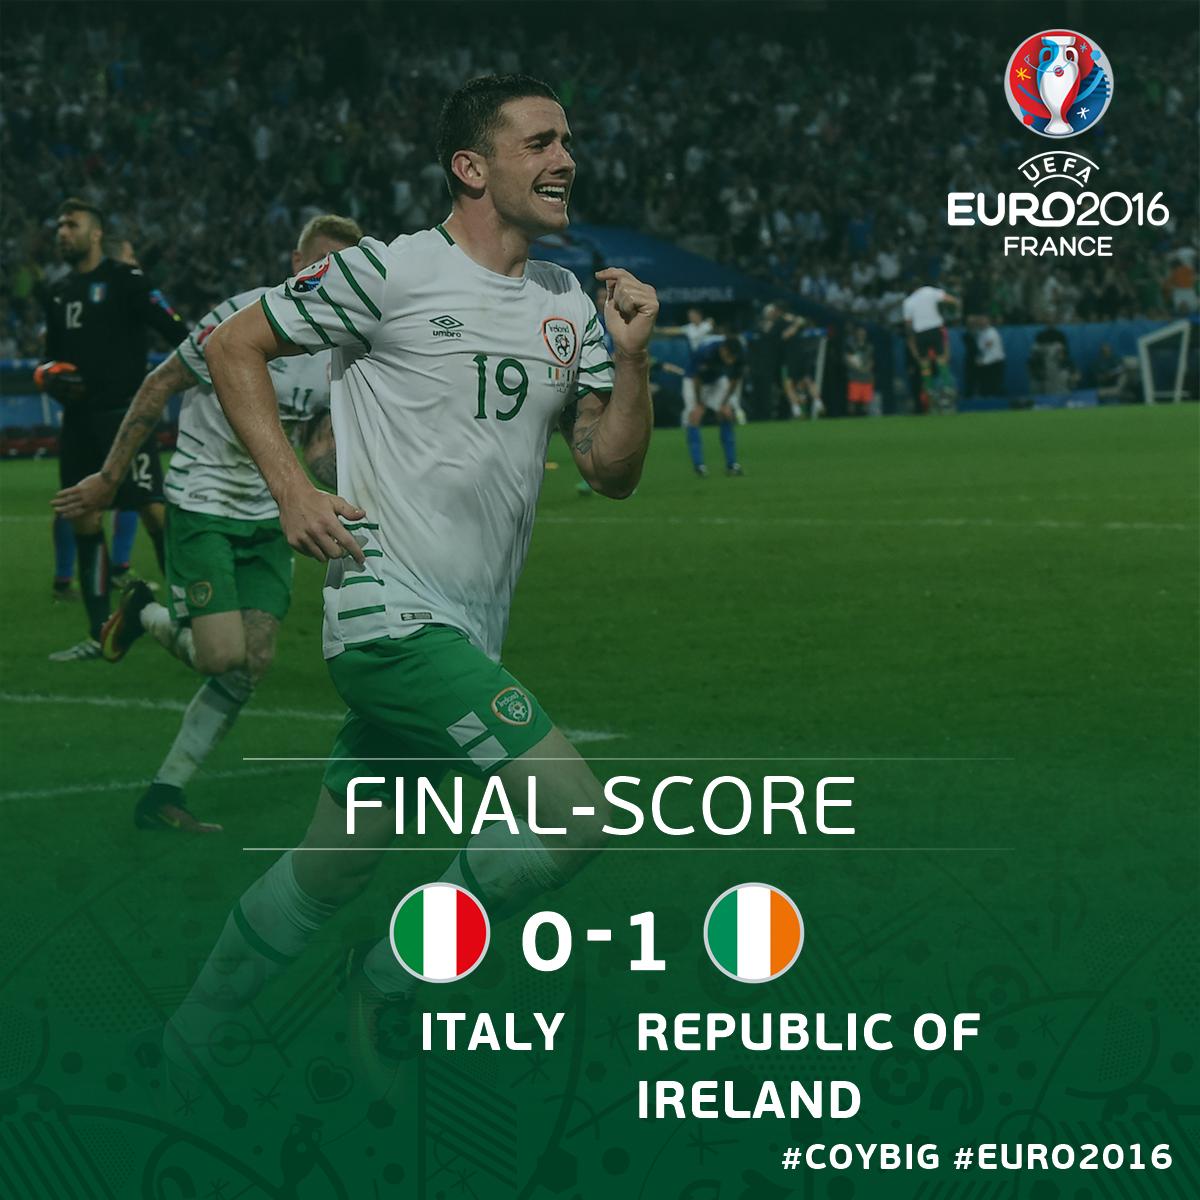 Republic of Ireland qualifies for Euro 2016 Round of 16